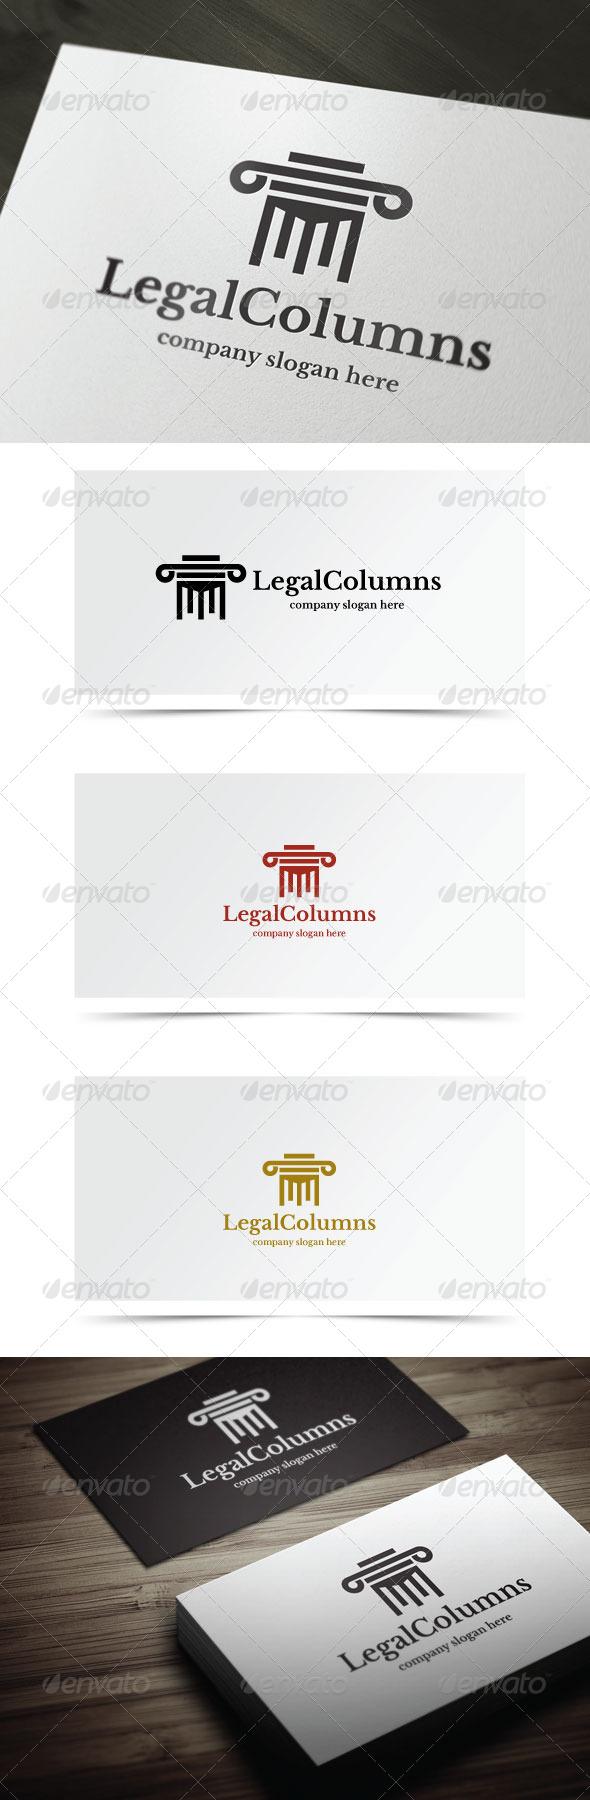 GraphicRiver Legal Columns 6913954